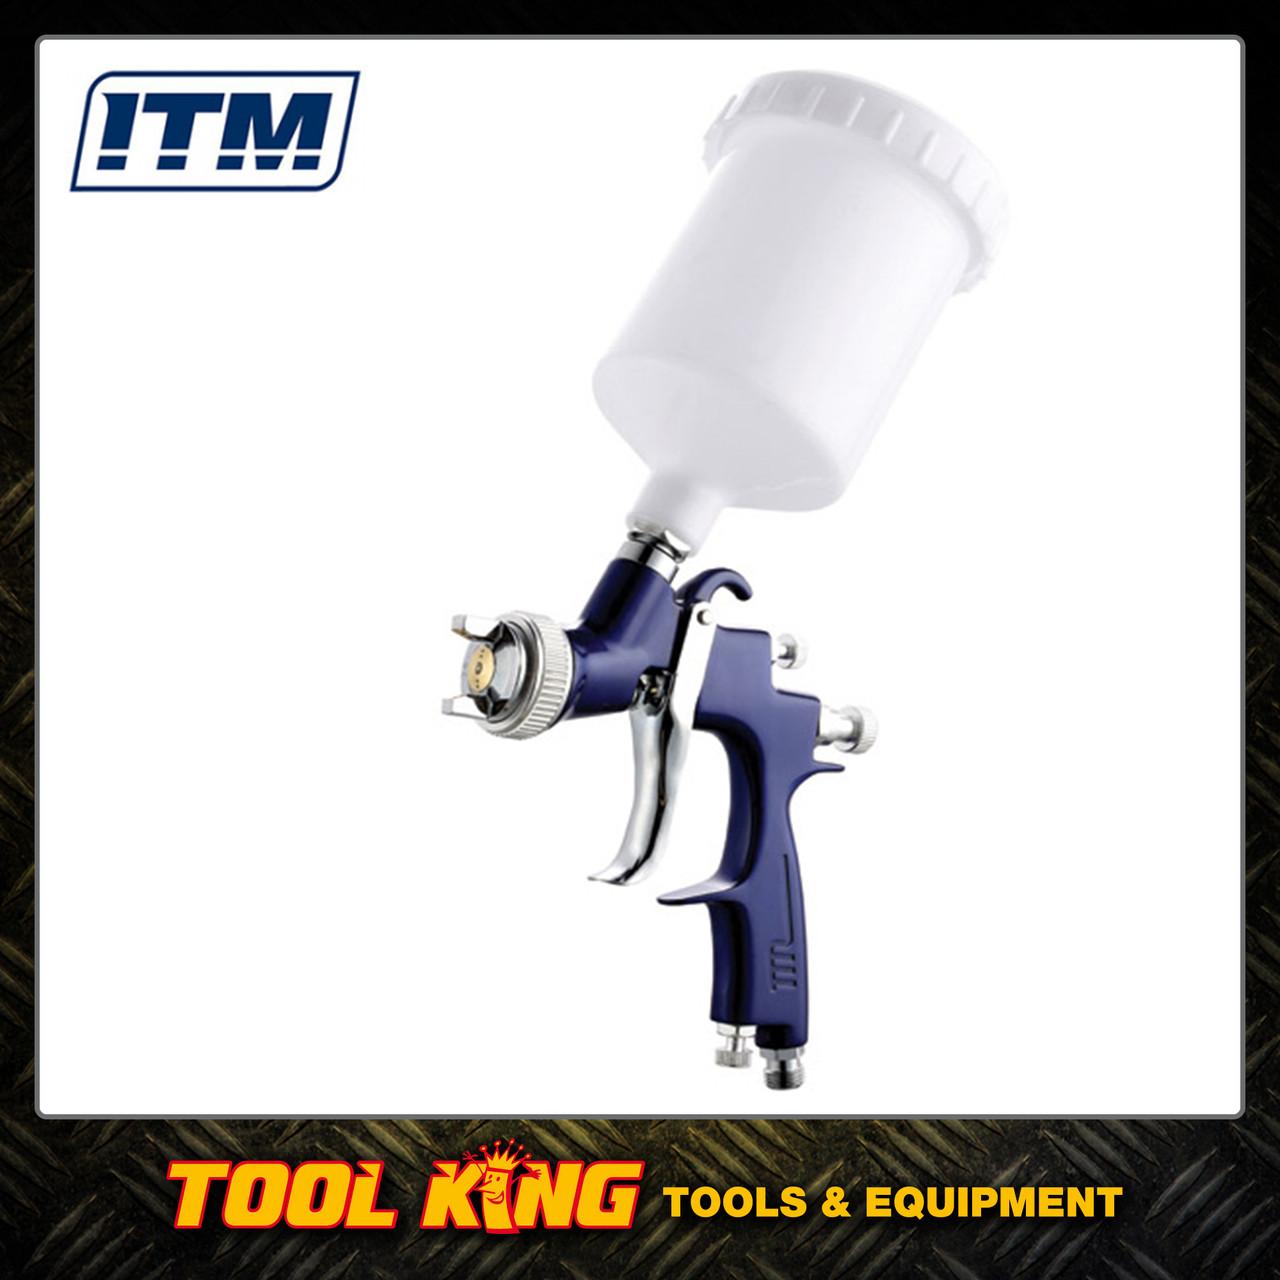 Air Spray Gun General purpose Gravity fed ITM Trade quality